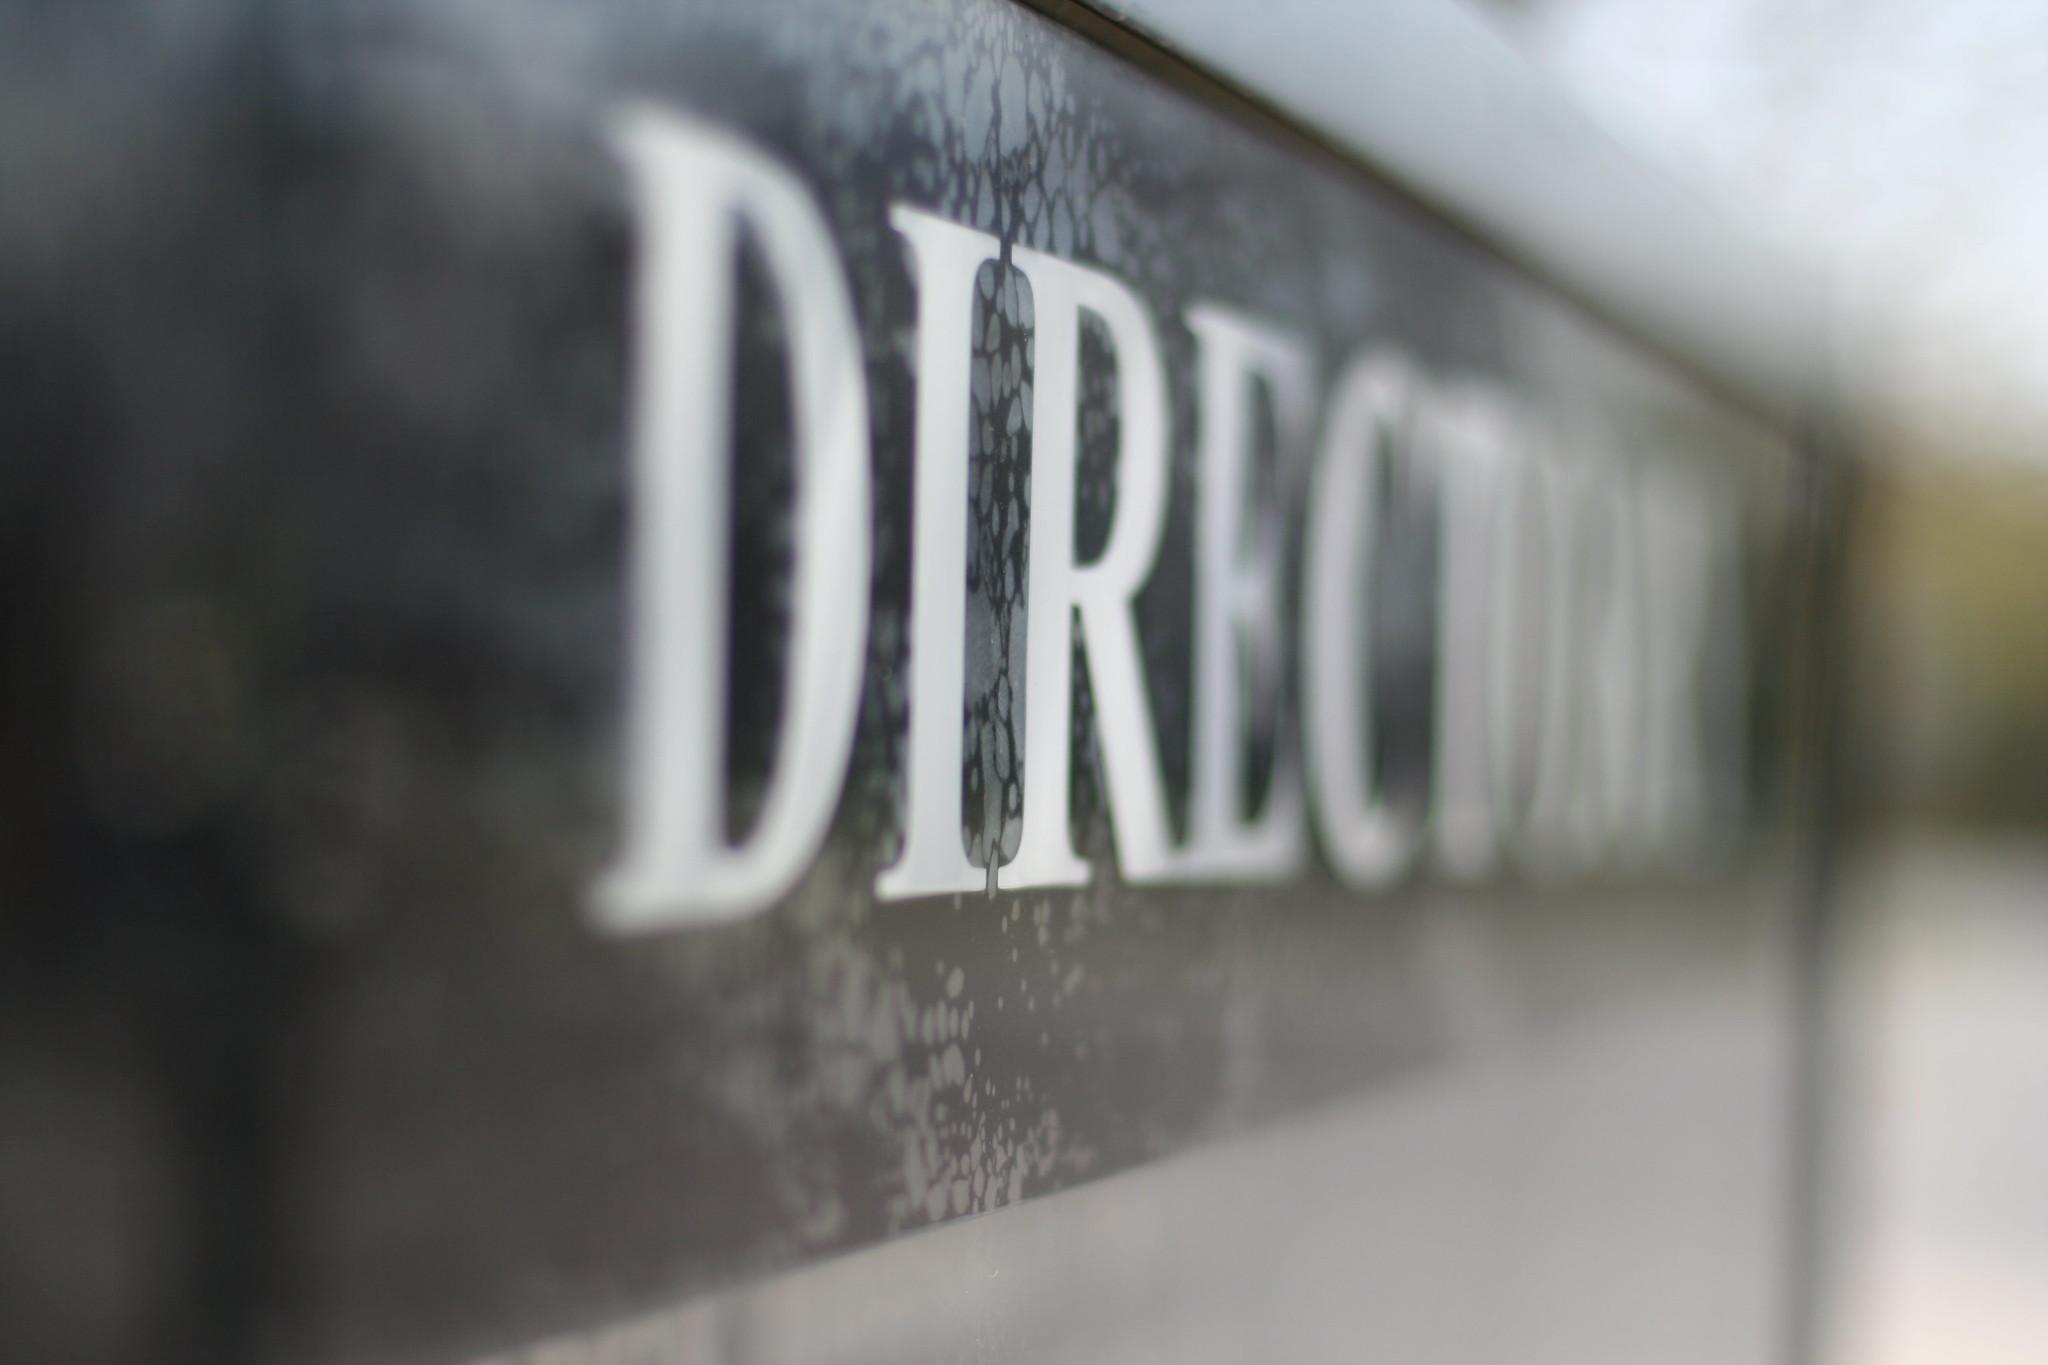 5 Best US Business Directories In 2021